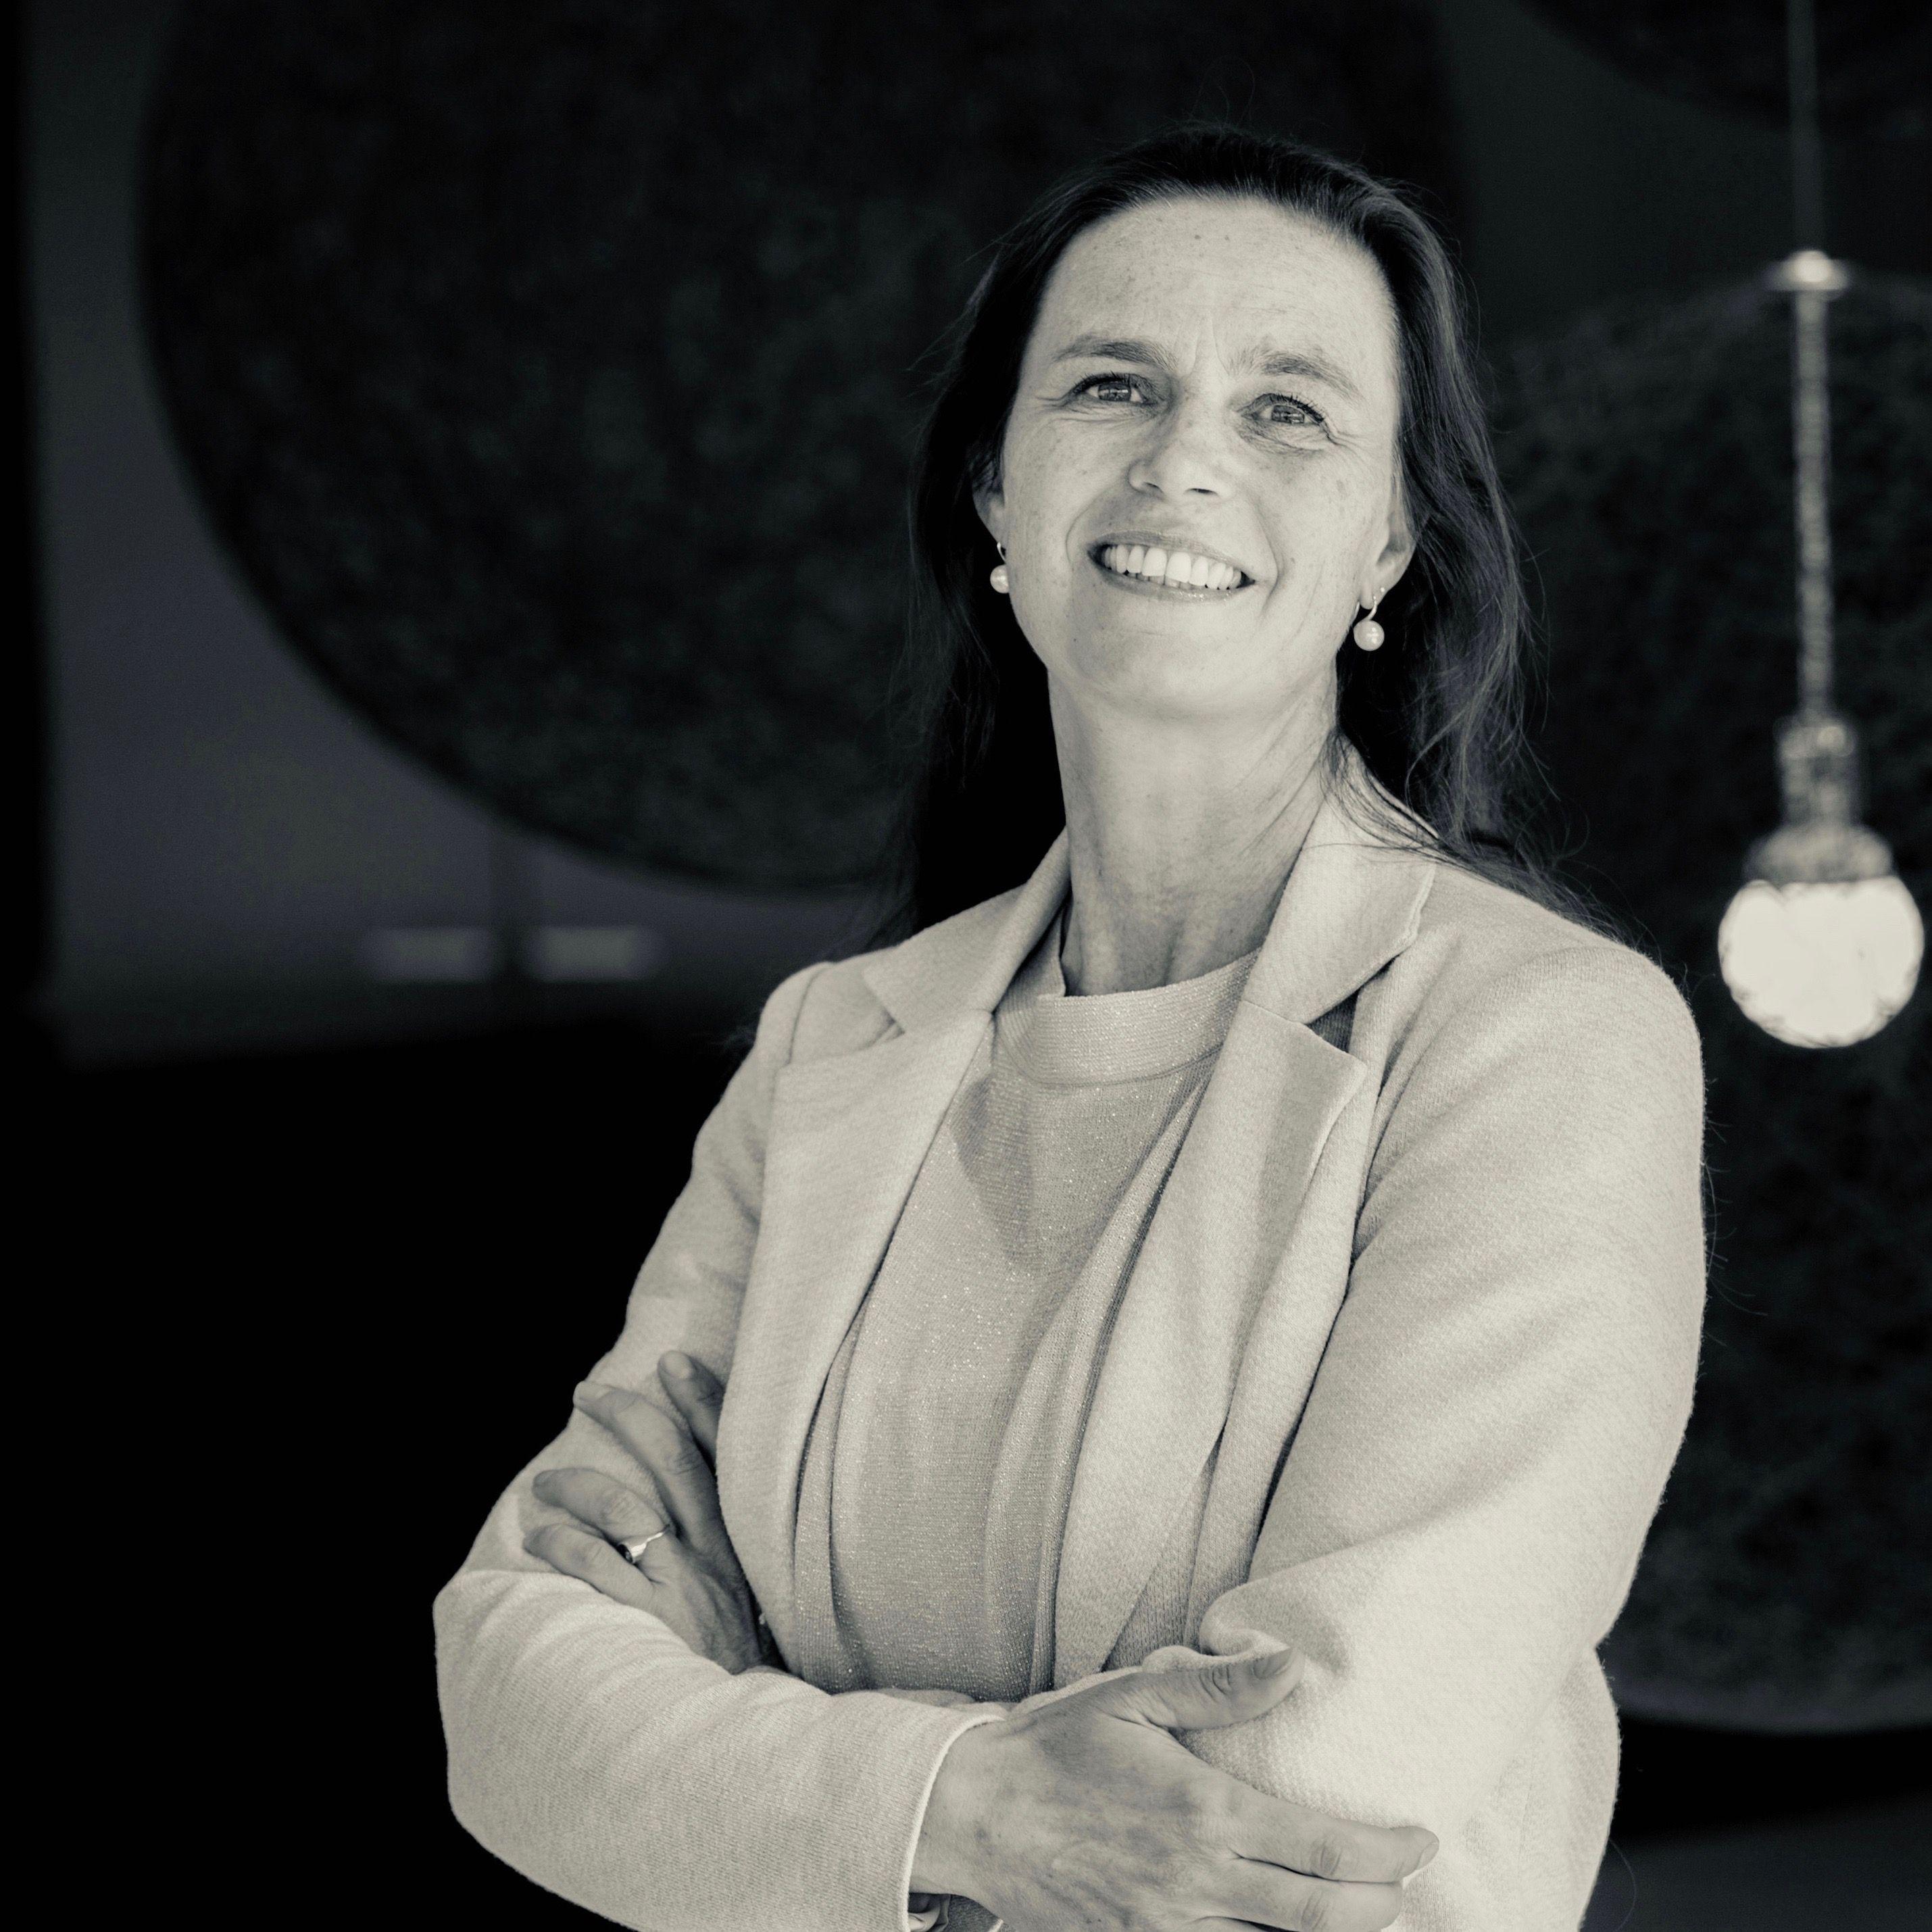 Helene Geijtenbeek